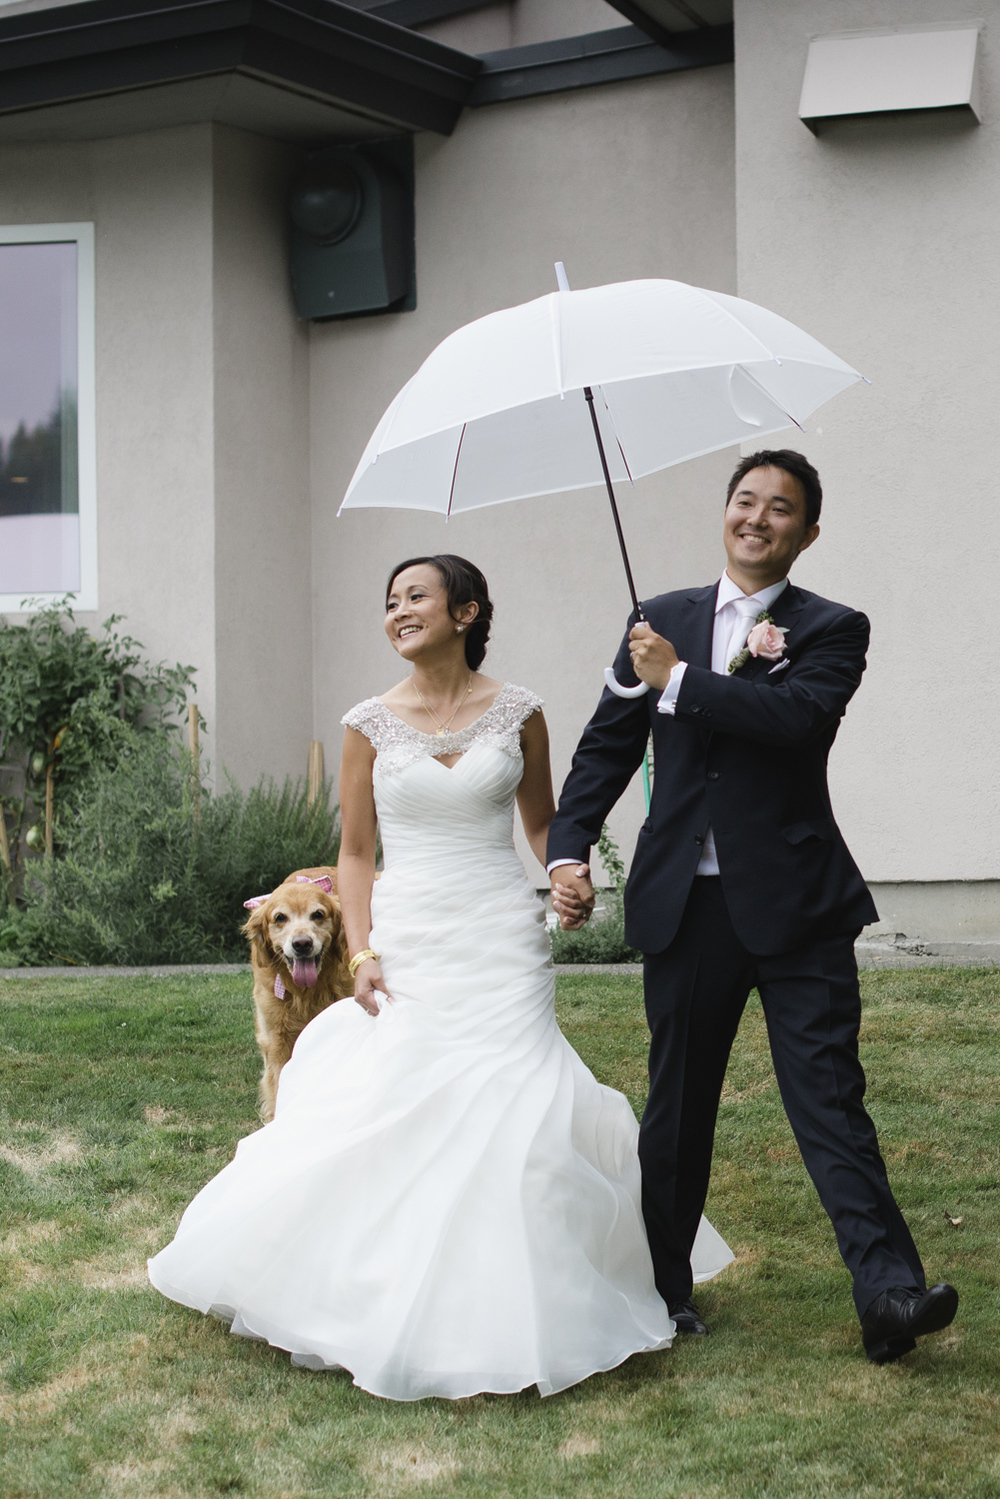 Kelly & Justin_Deer Lake Park Wedding_Vancouver Wedding Photography-Katie Powell Photography_45.jpg